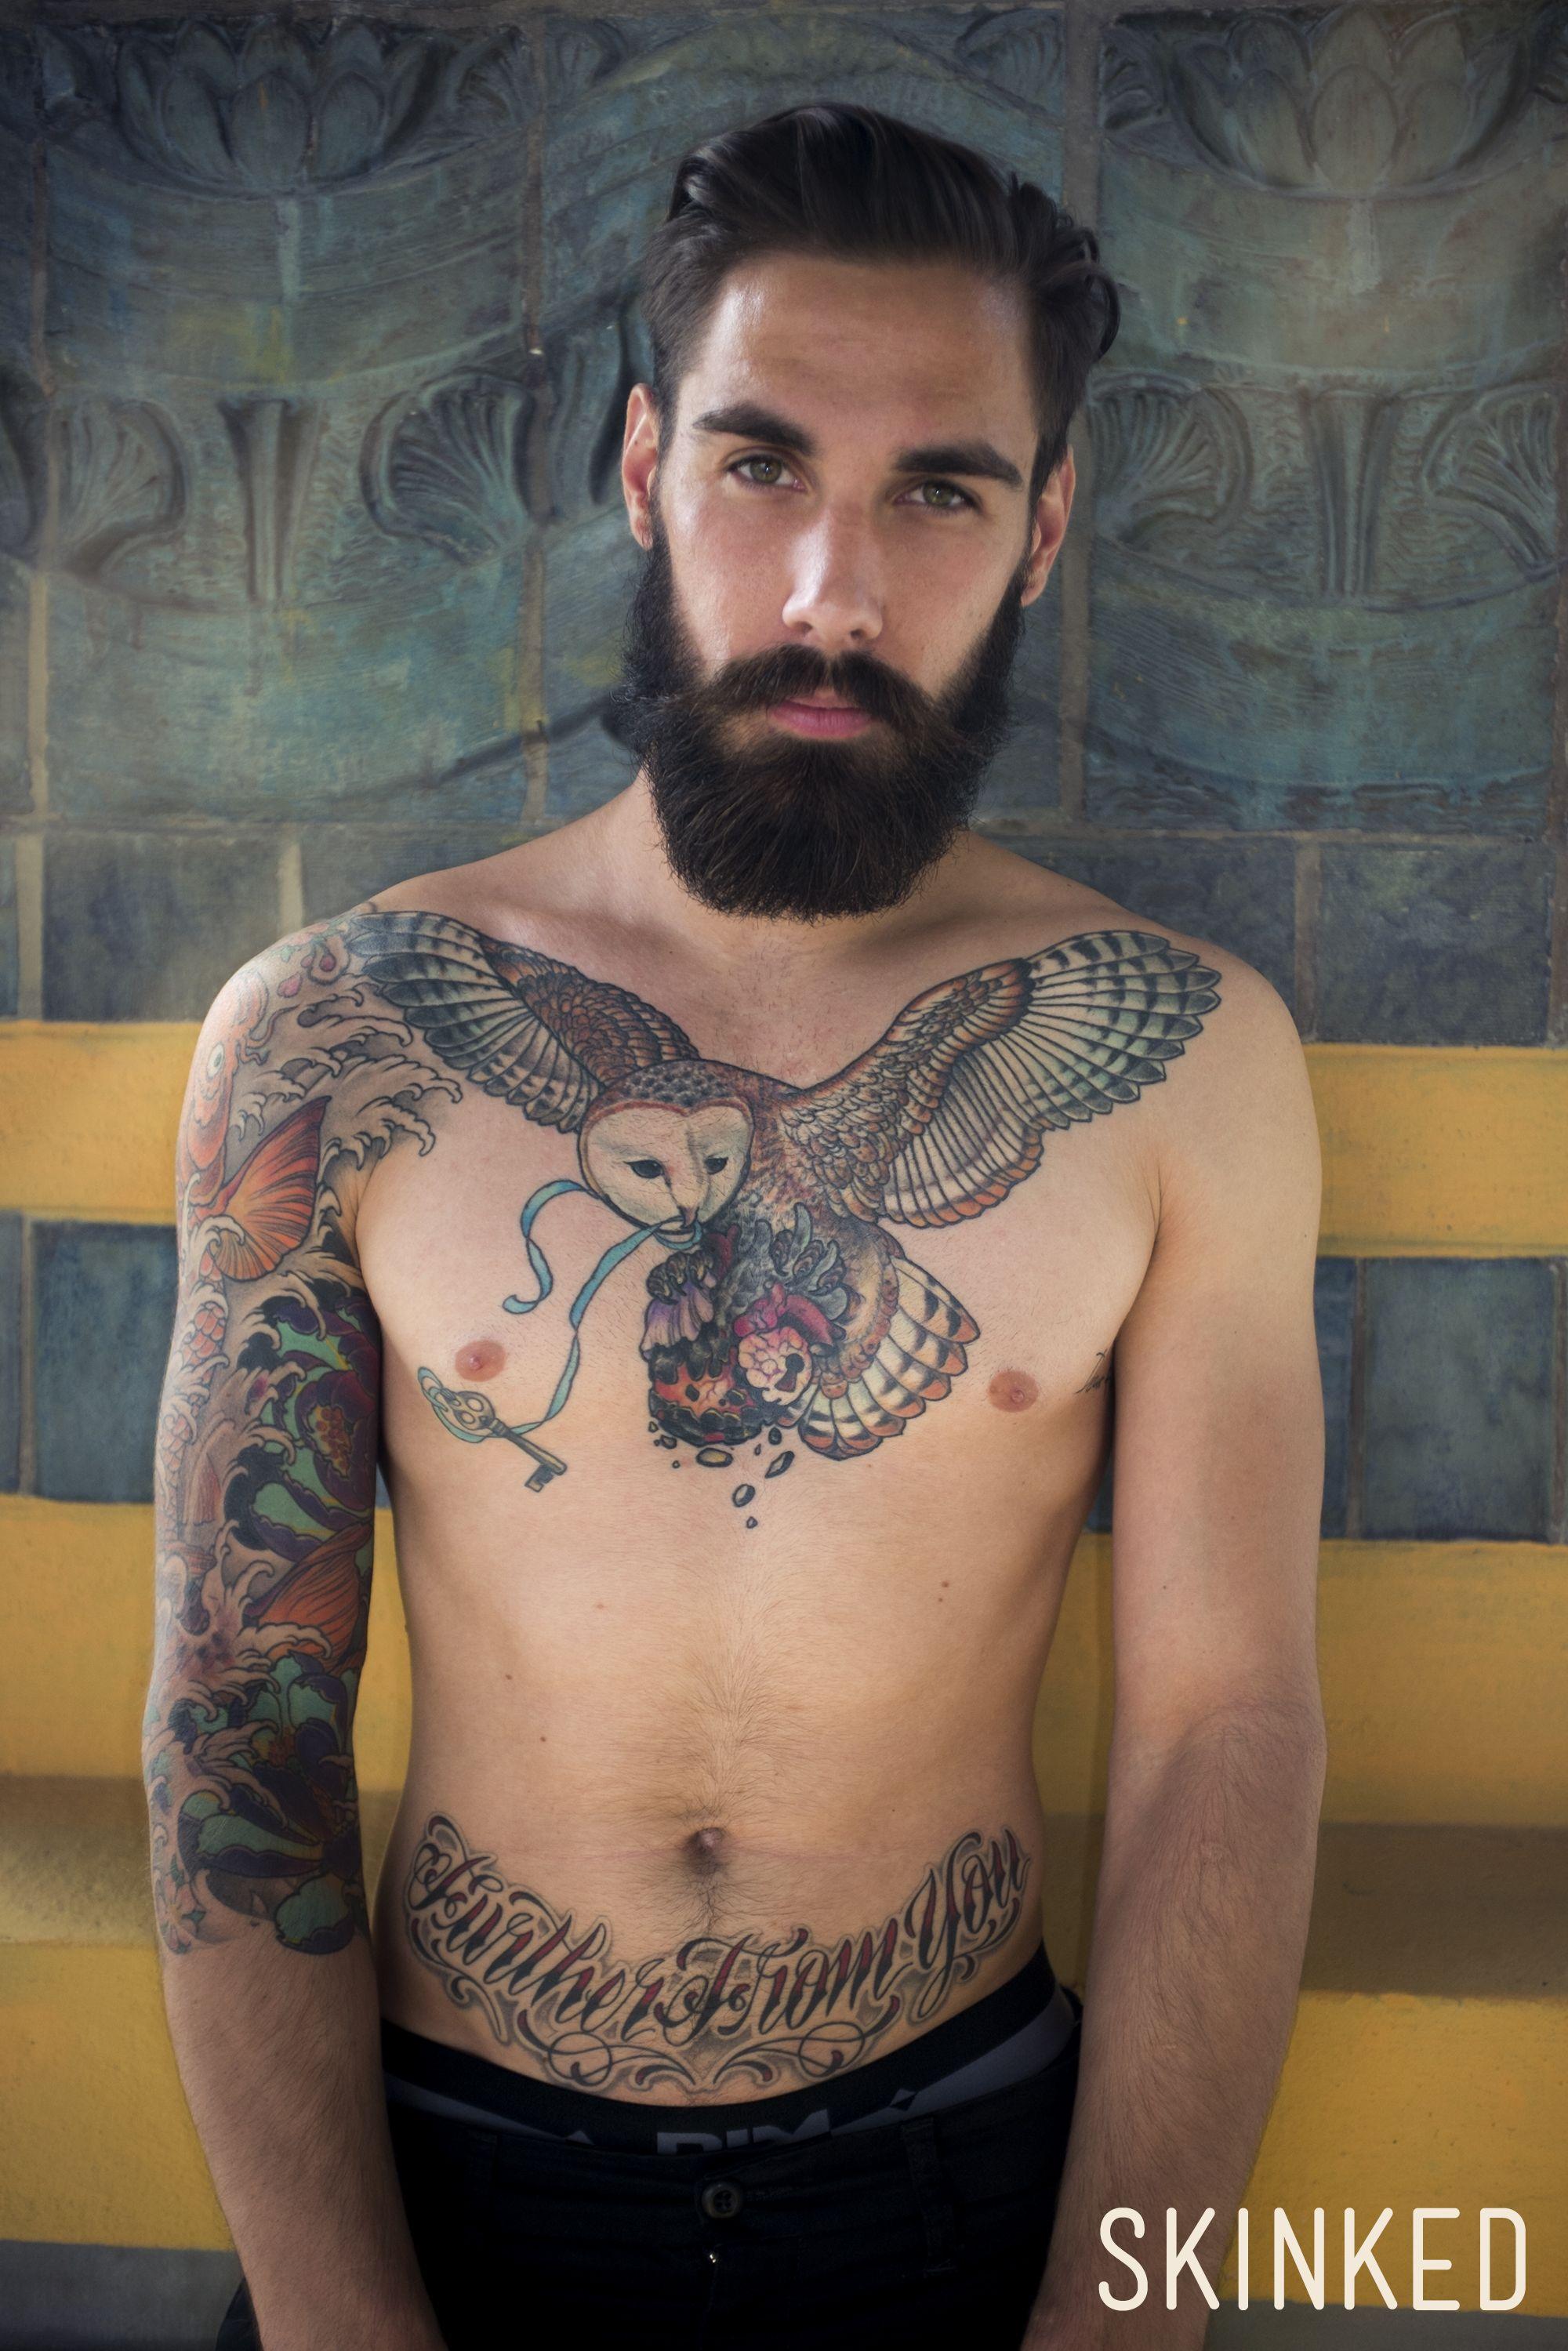 portrait de samuel lhermillier le plombier devenu mod le tattoo tatouage skinked tatoo. Black Bedroom Furniture Sets. Home Design Ideas